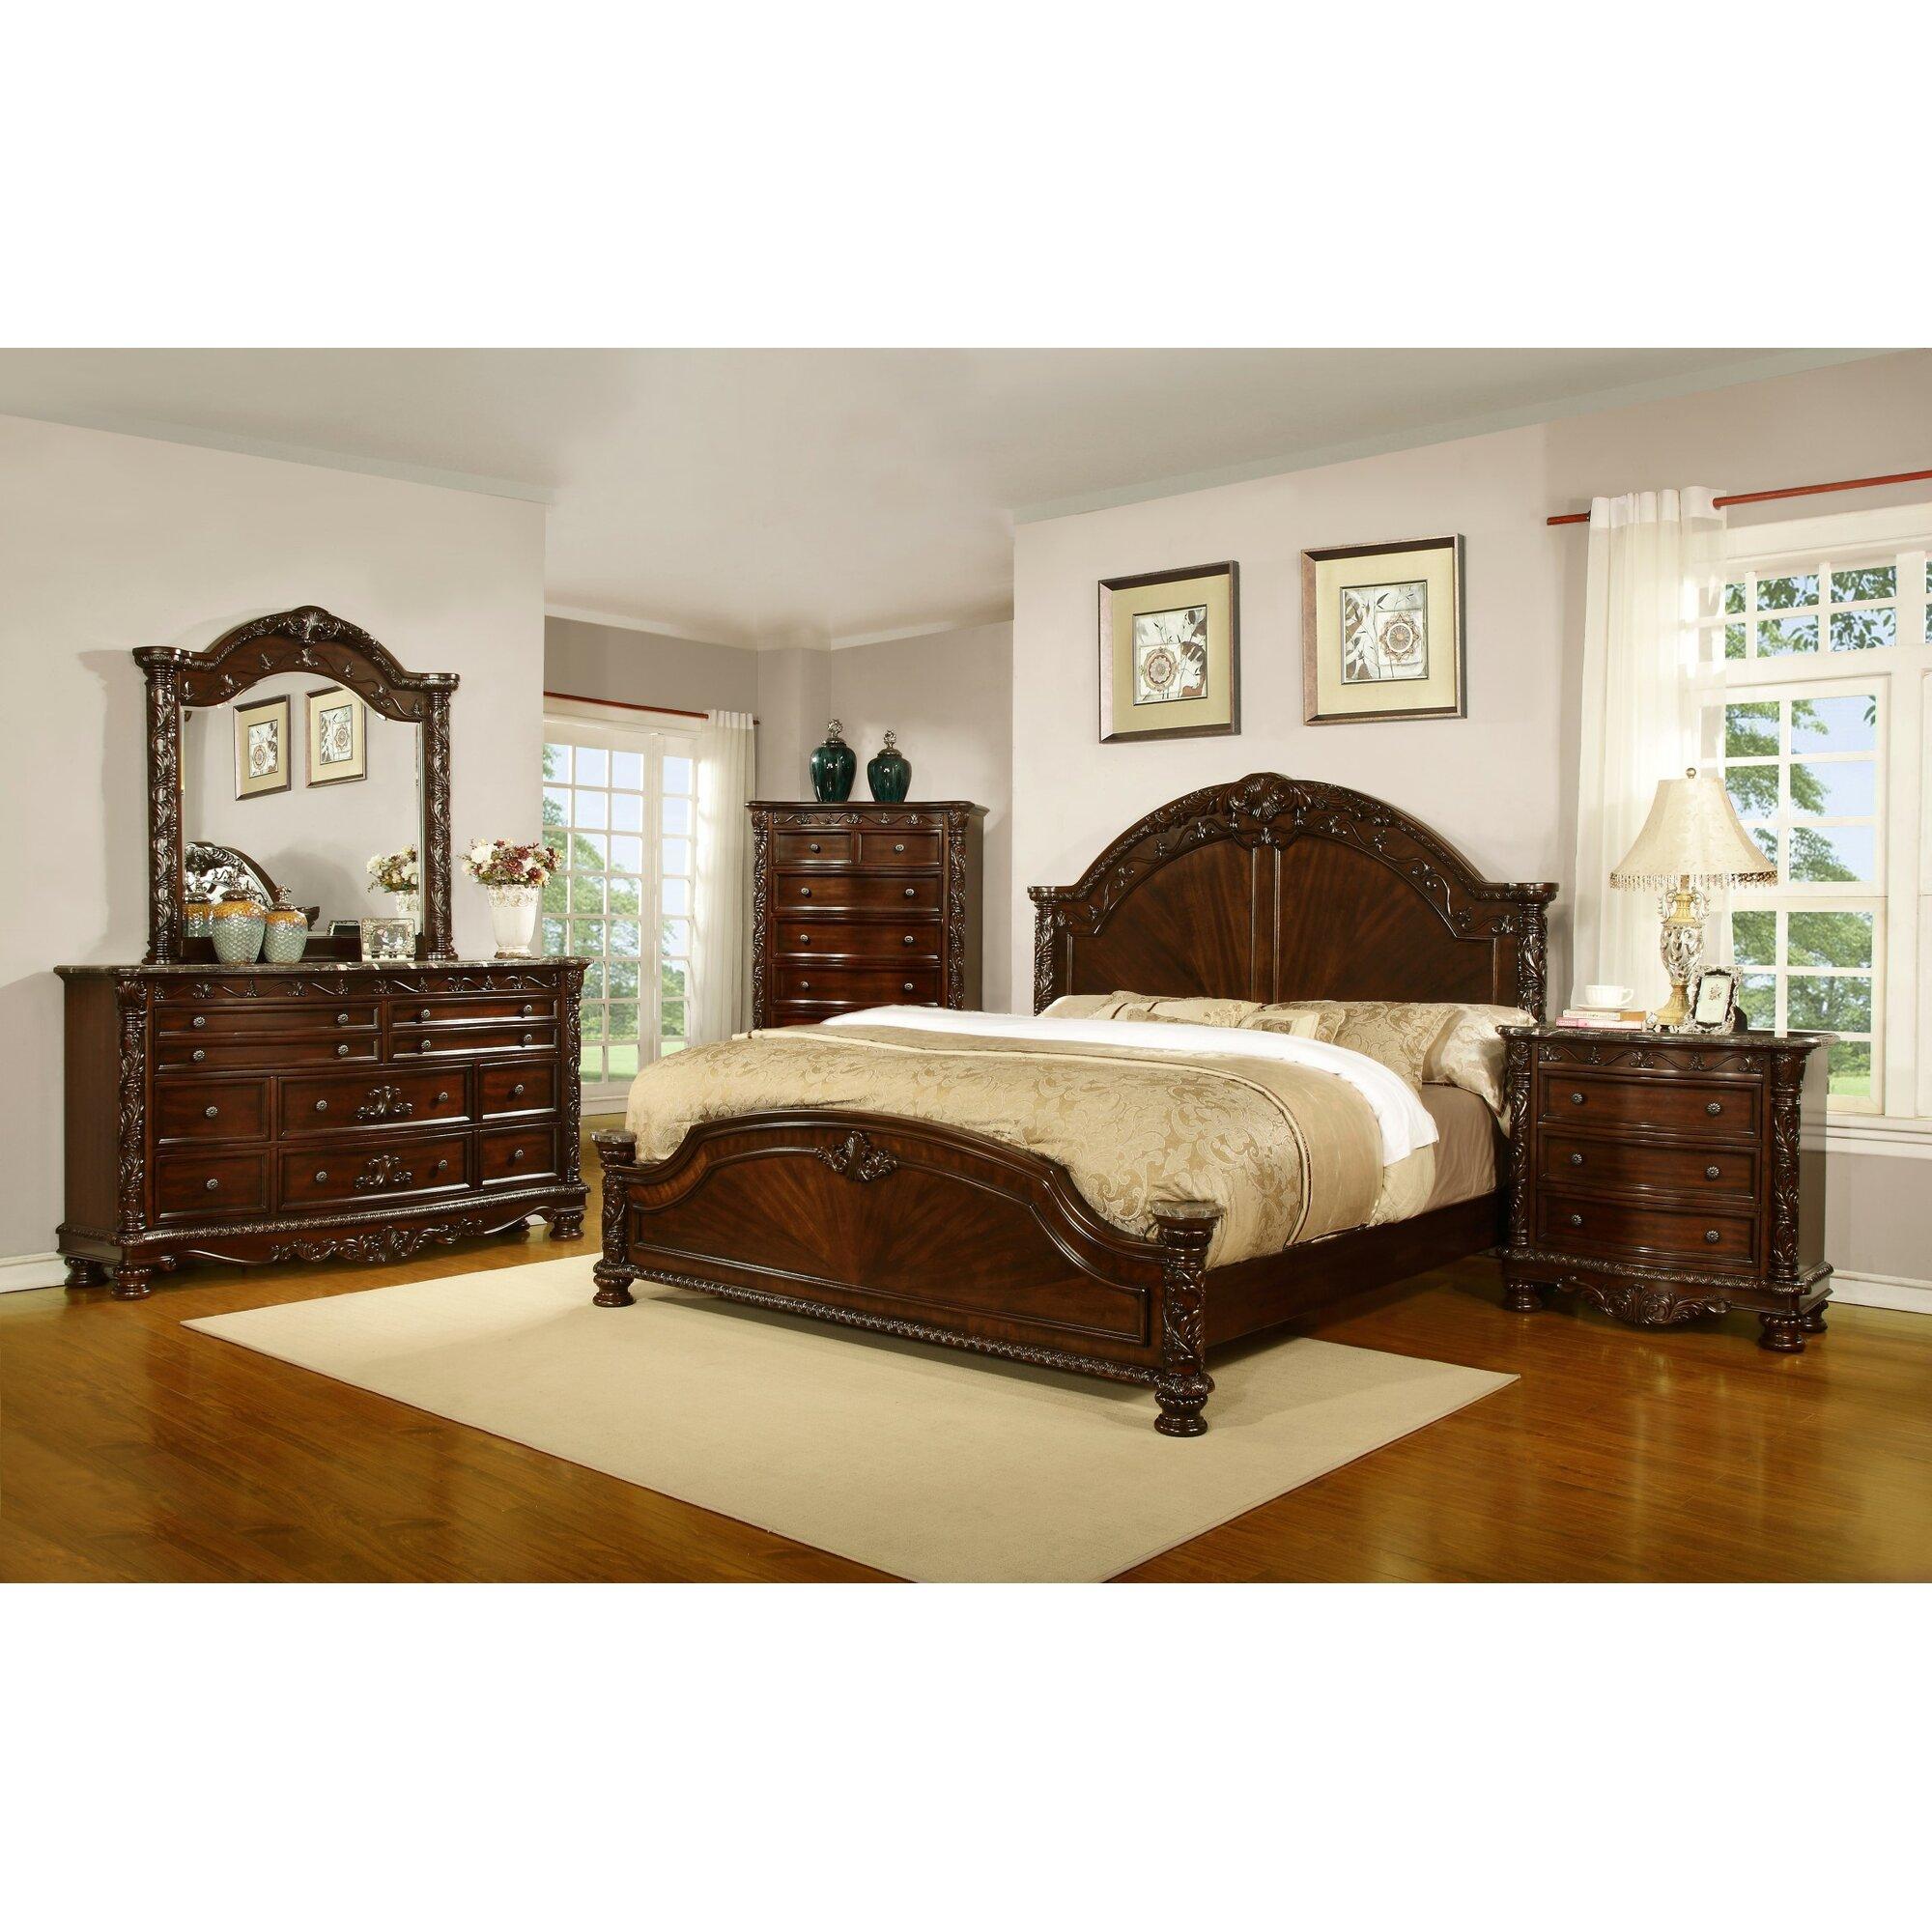 Sleigh Bedroom Sets Youll Love Wayfair - Online shaker style bedroom furniture